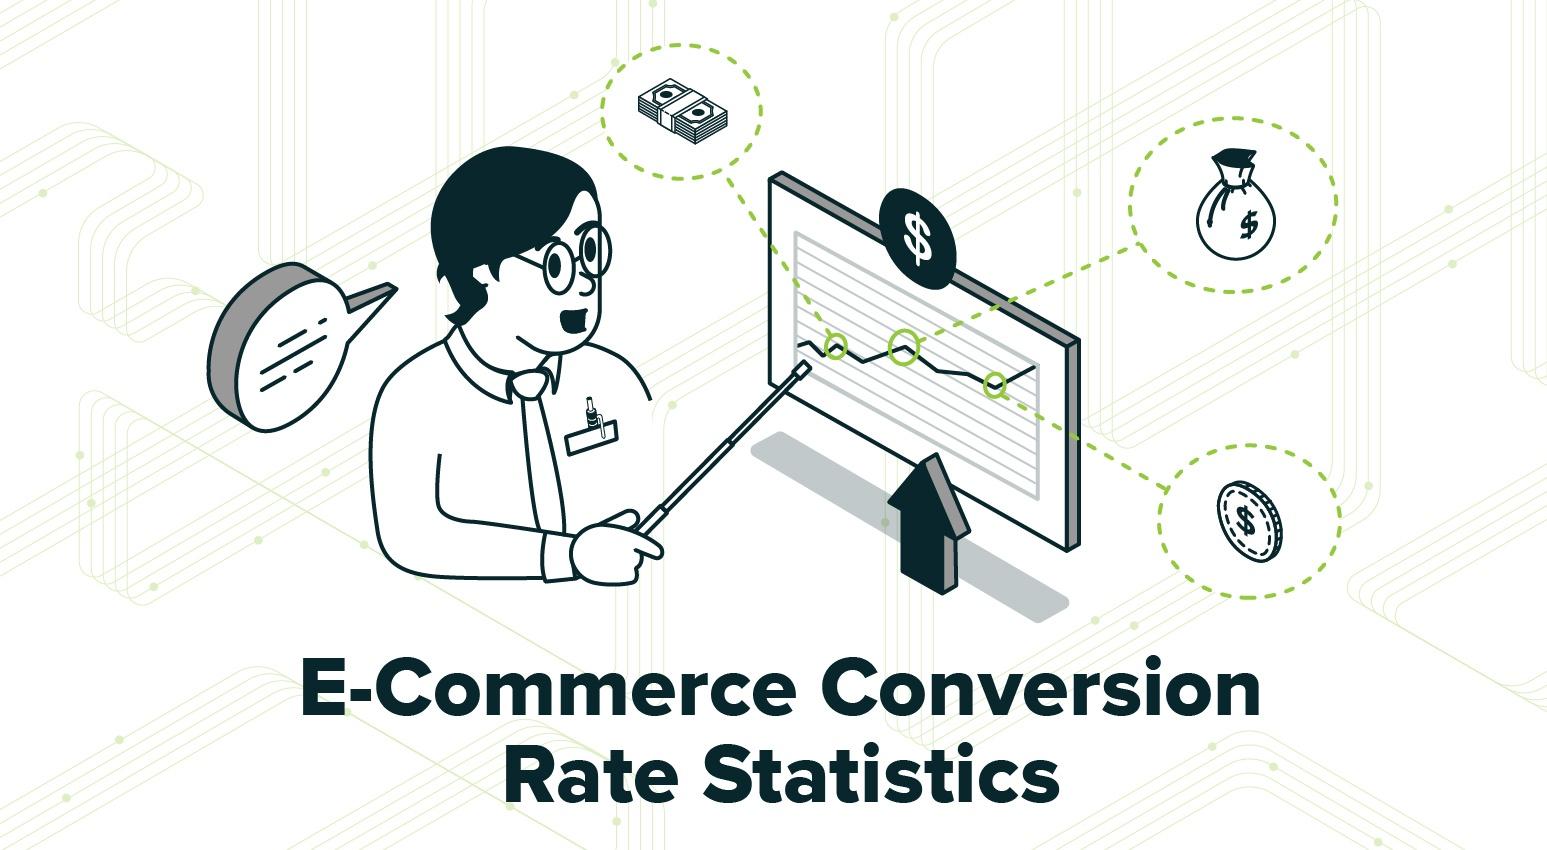 E-Commerce_Conversion_Rate_Statistics.jpg